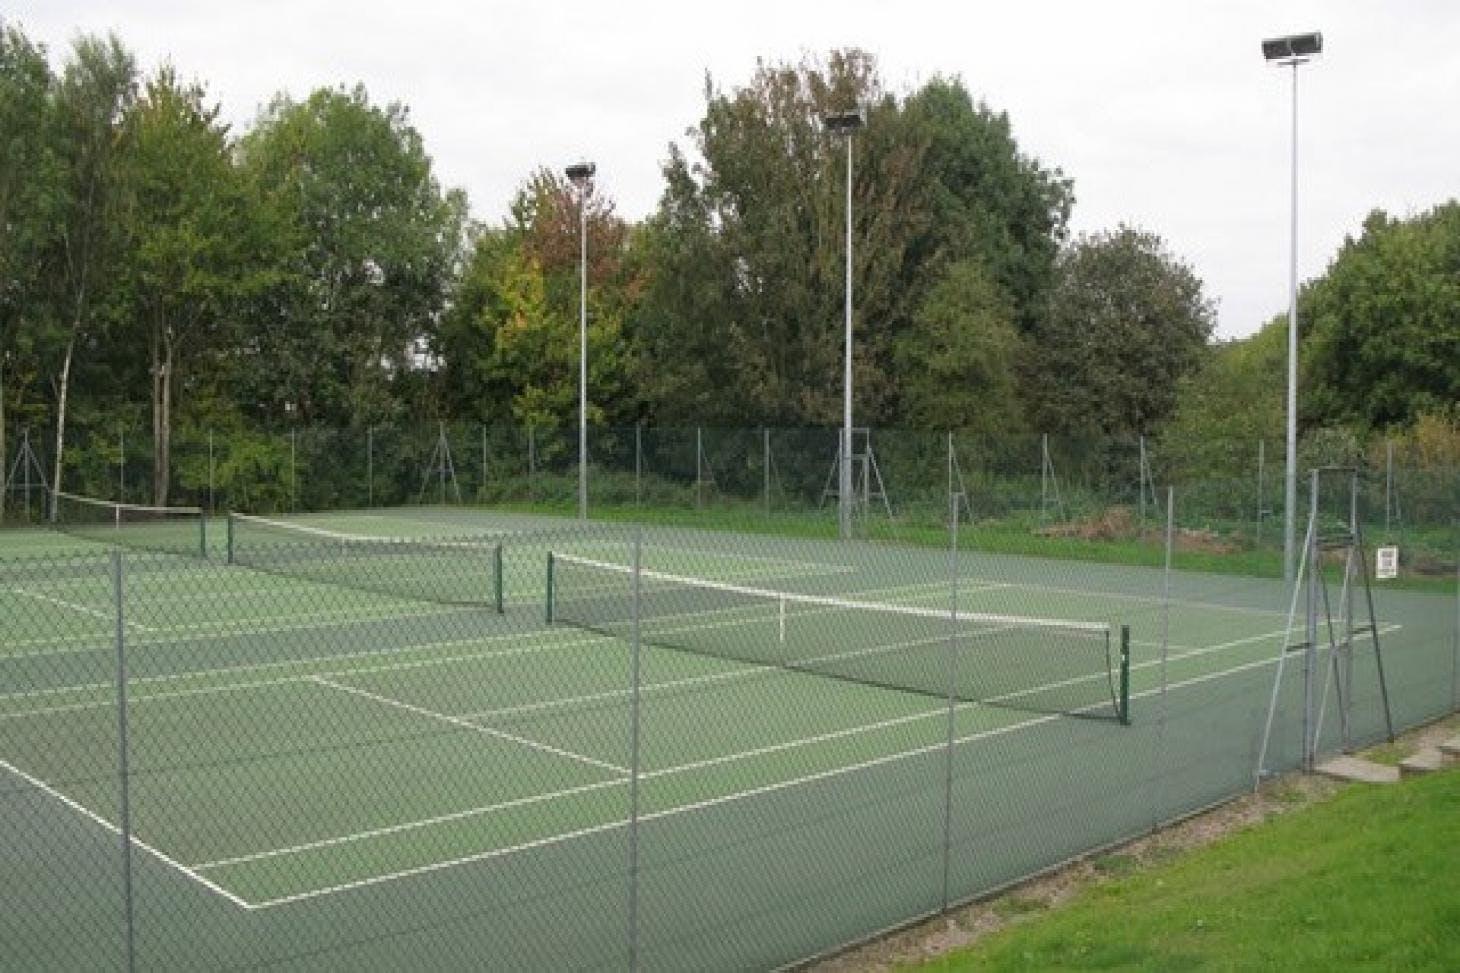 Walthamstow Cricket, Tennis And Squash Club Outdoor | Hard (macadam) tennis court